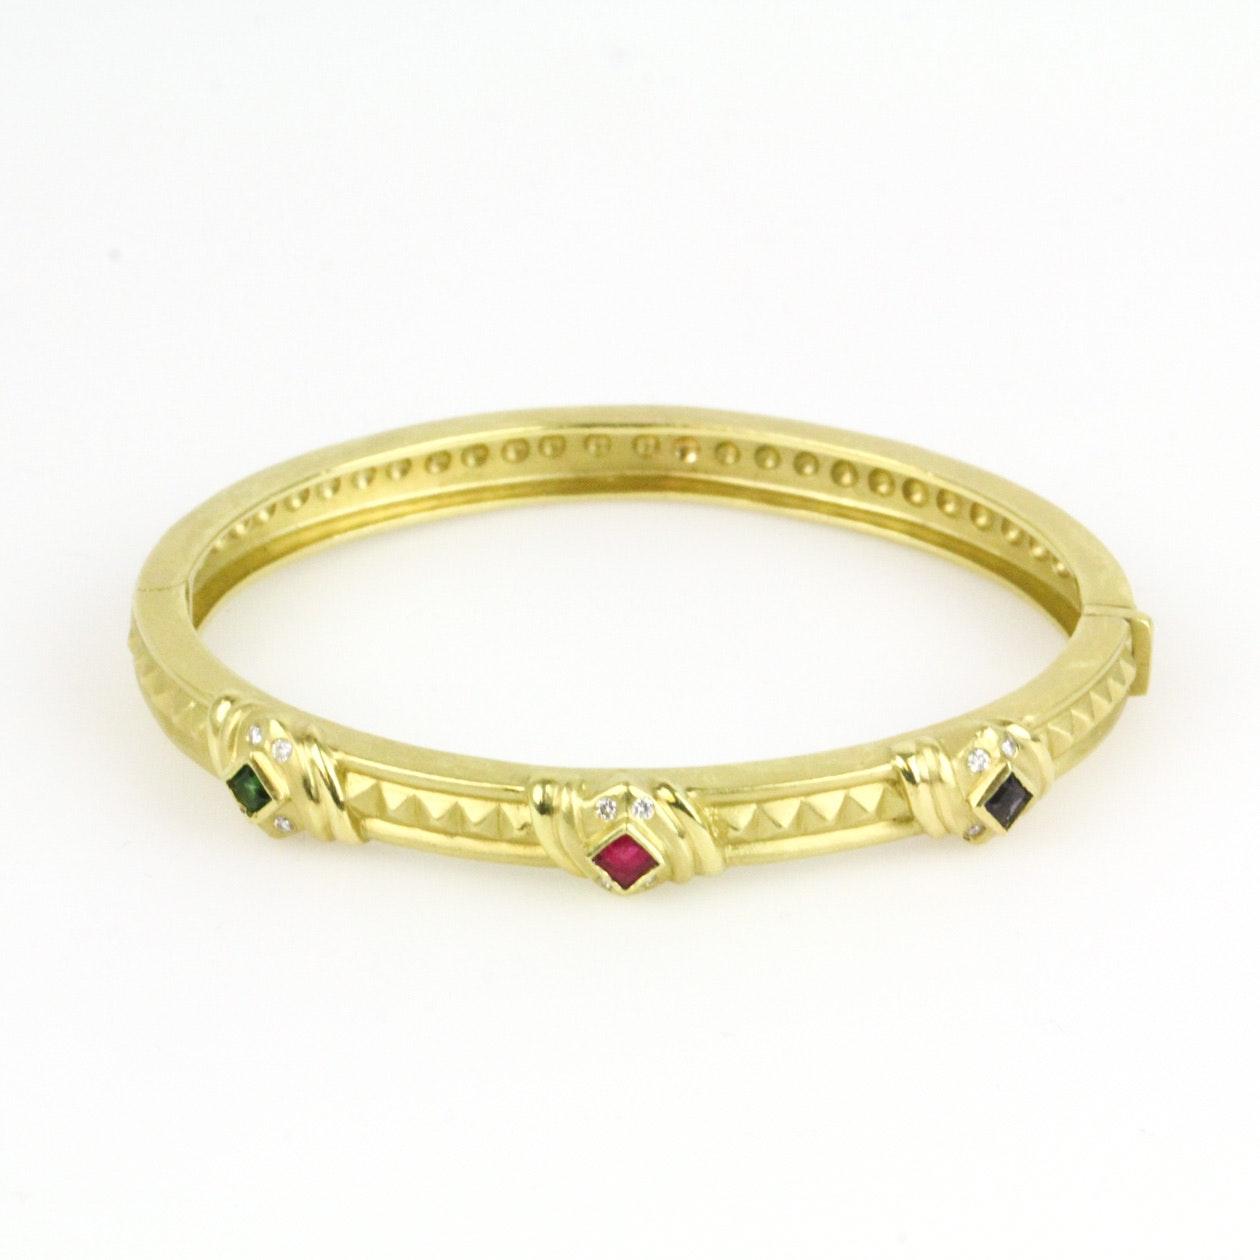 18K Yellow Gold, Sapphire, Emerald, Diamond and Ruby Clasp Bangle